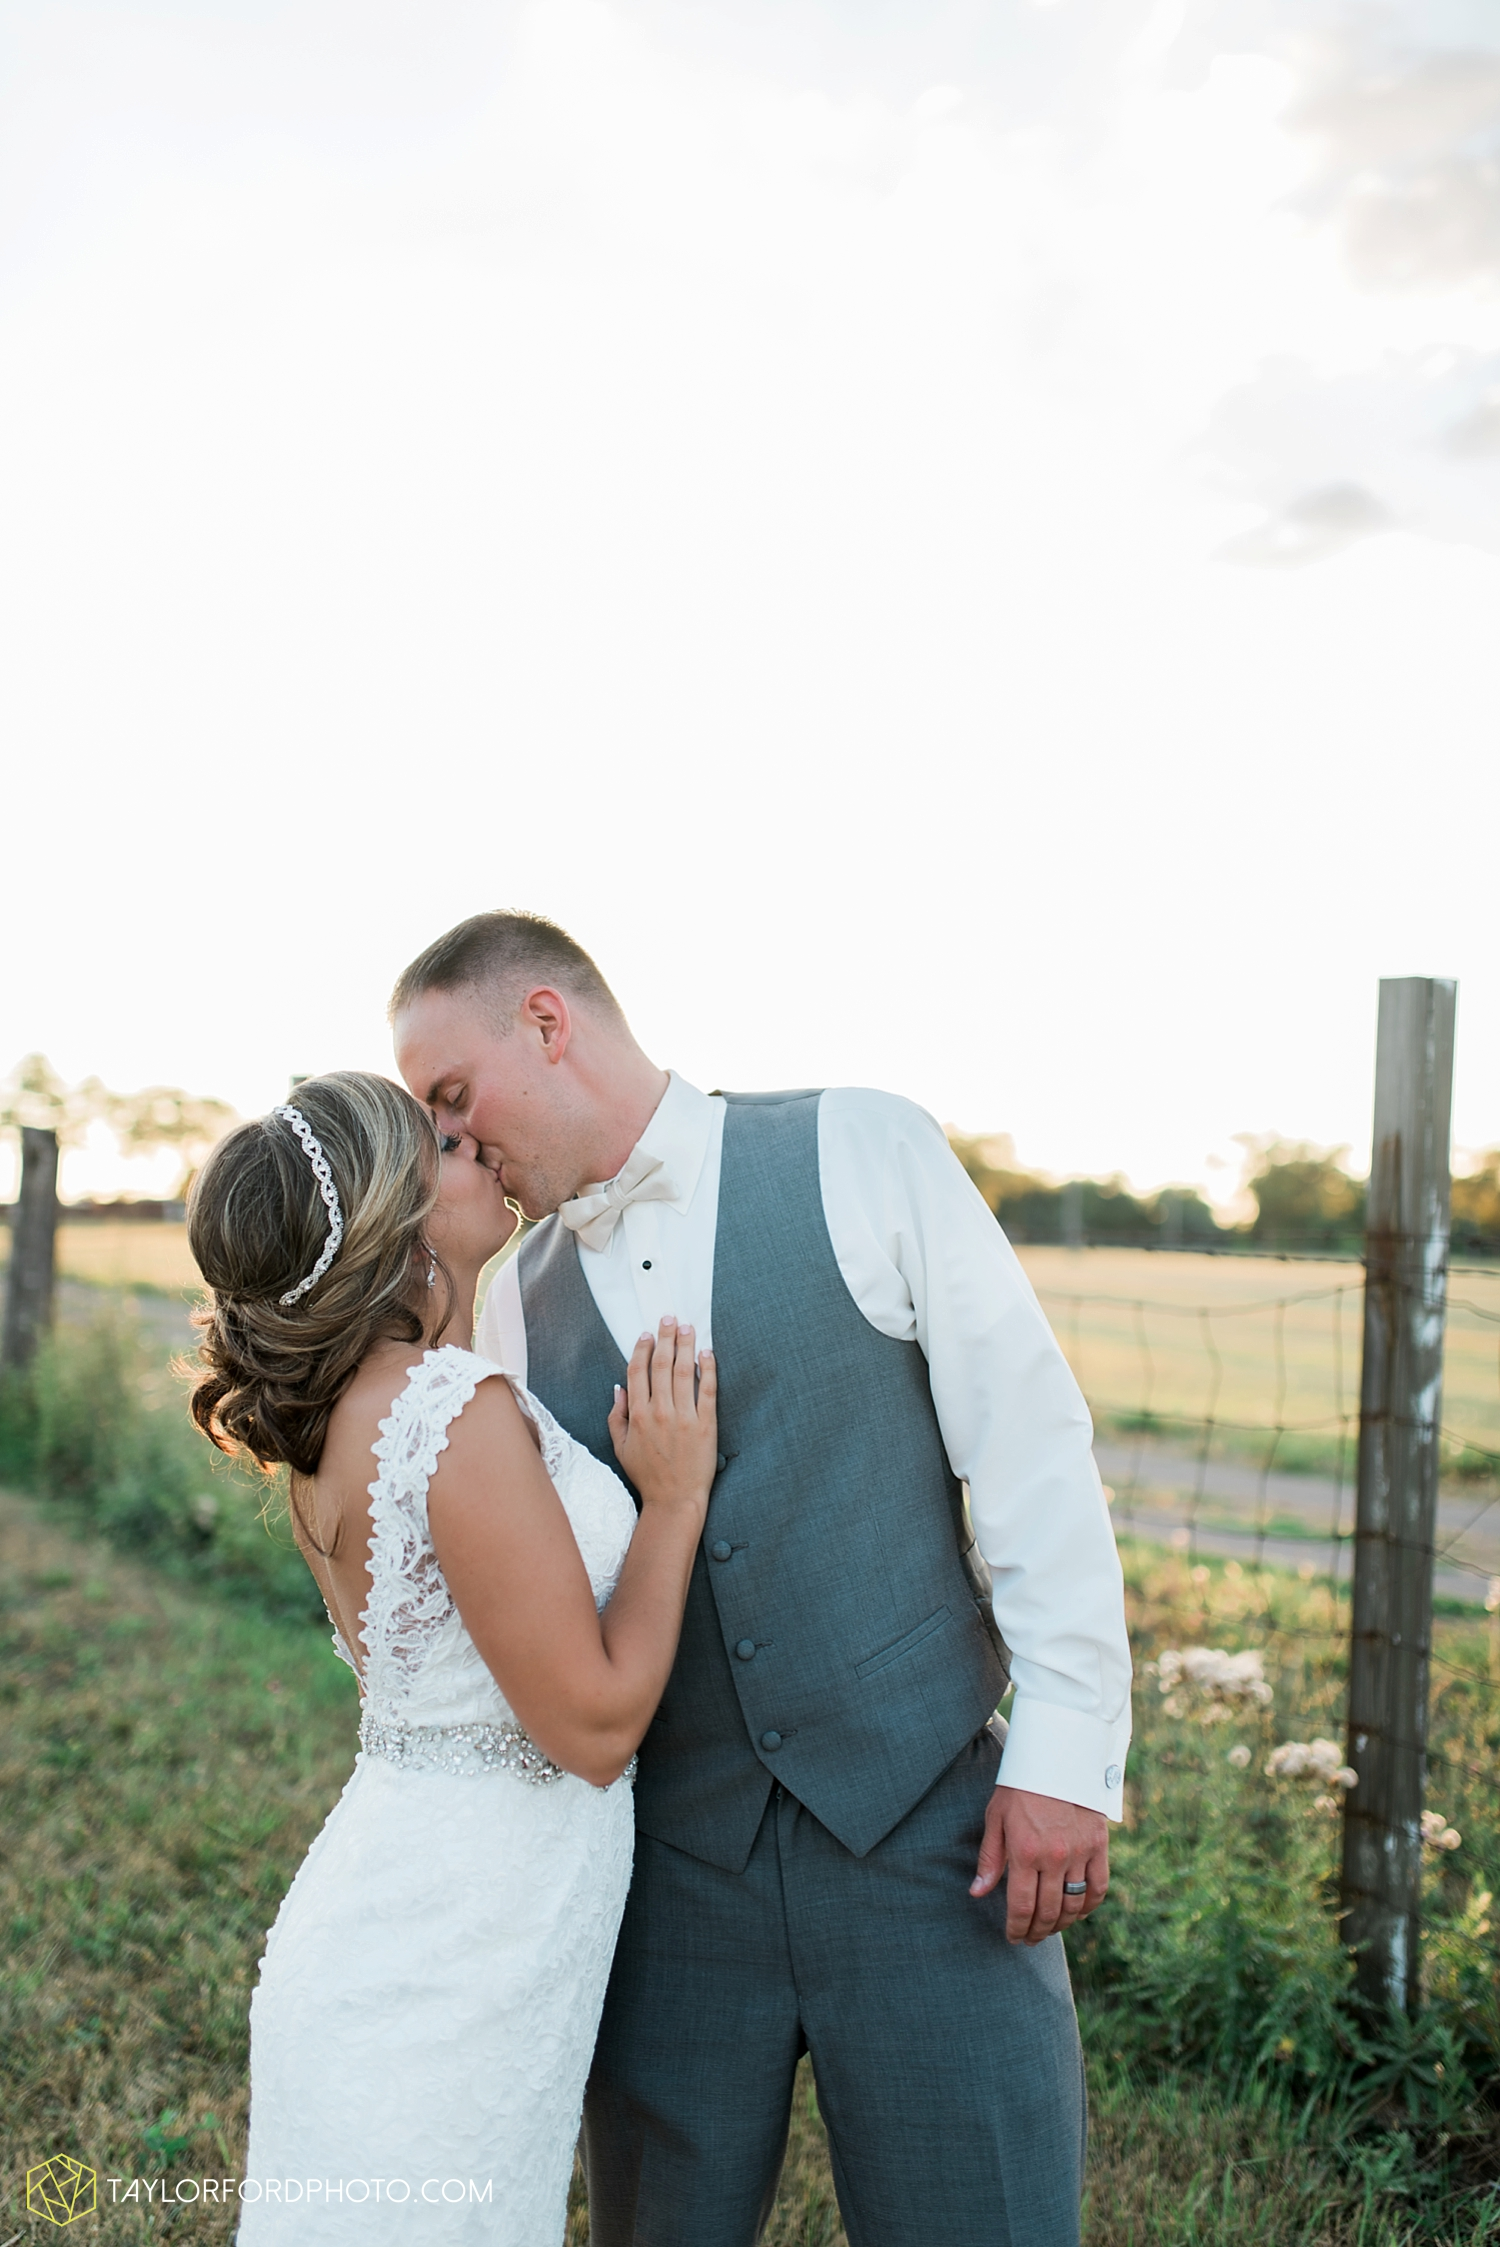 van_wert_wedding_photographer_taylor_ford_ohio_indiana_fort_wayne_2224.jpg